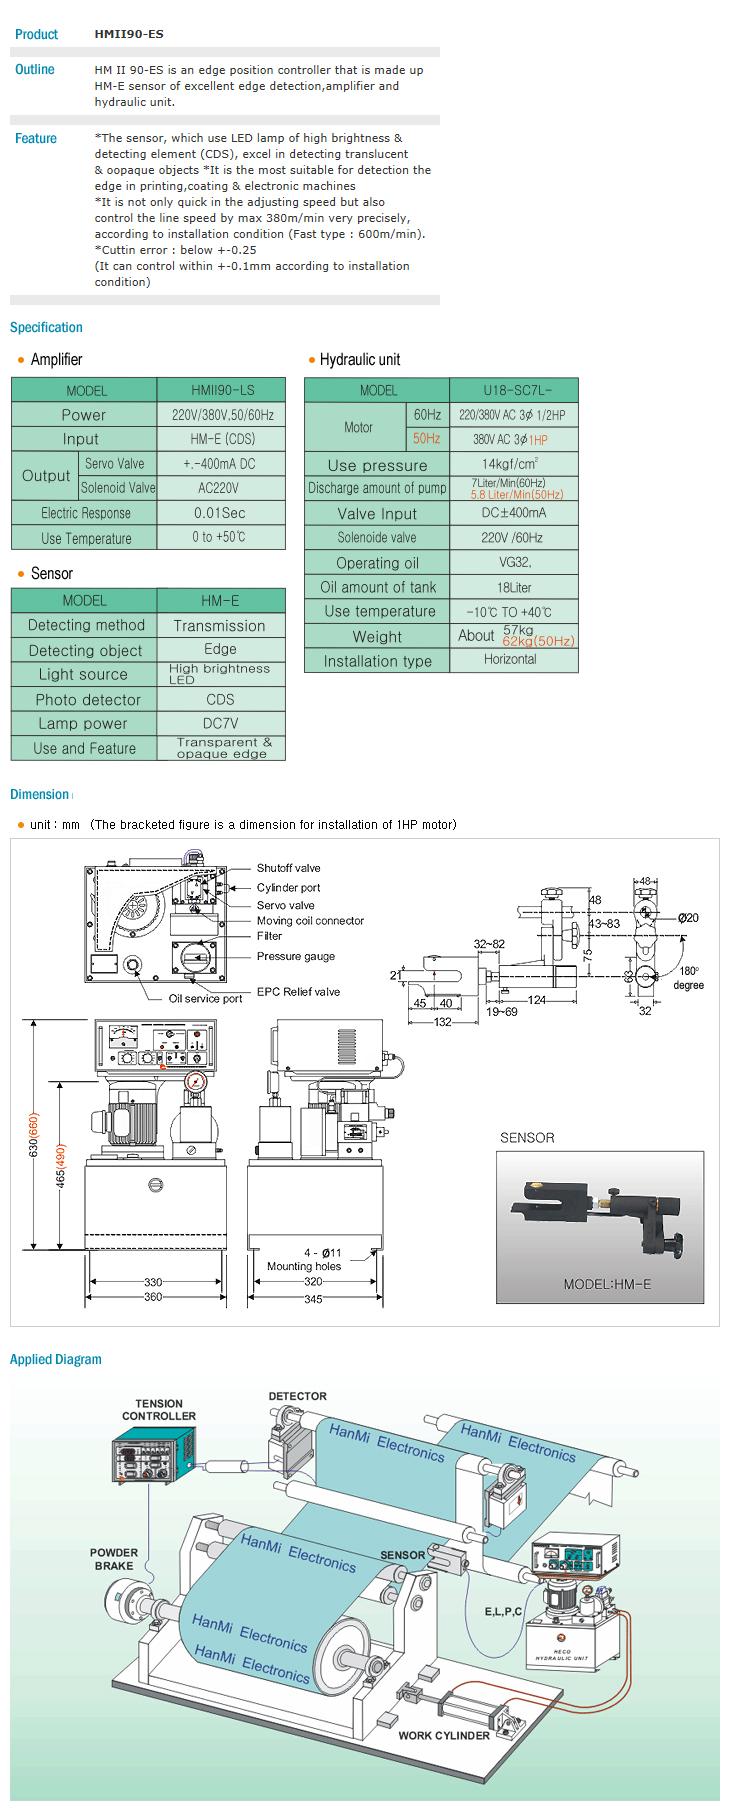 HANMI ELECTRONICS Hydraulic HMII90-ES